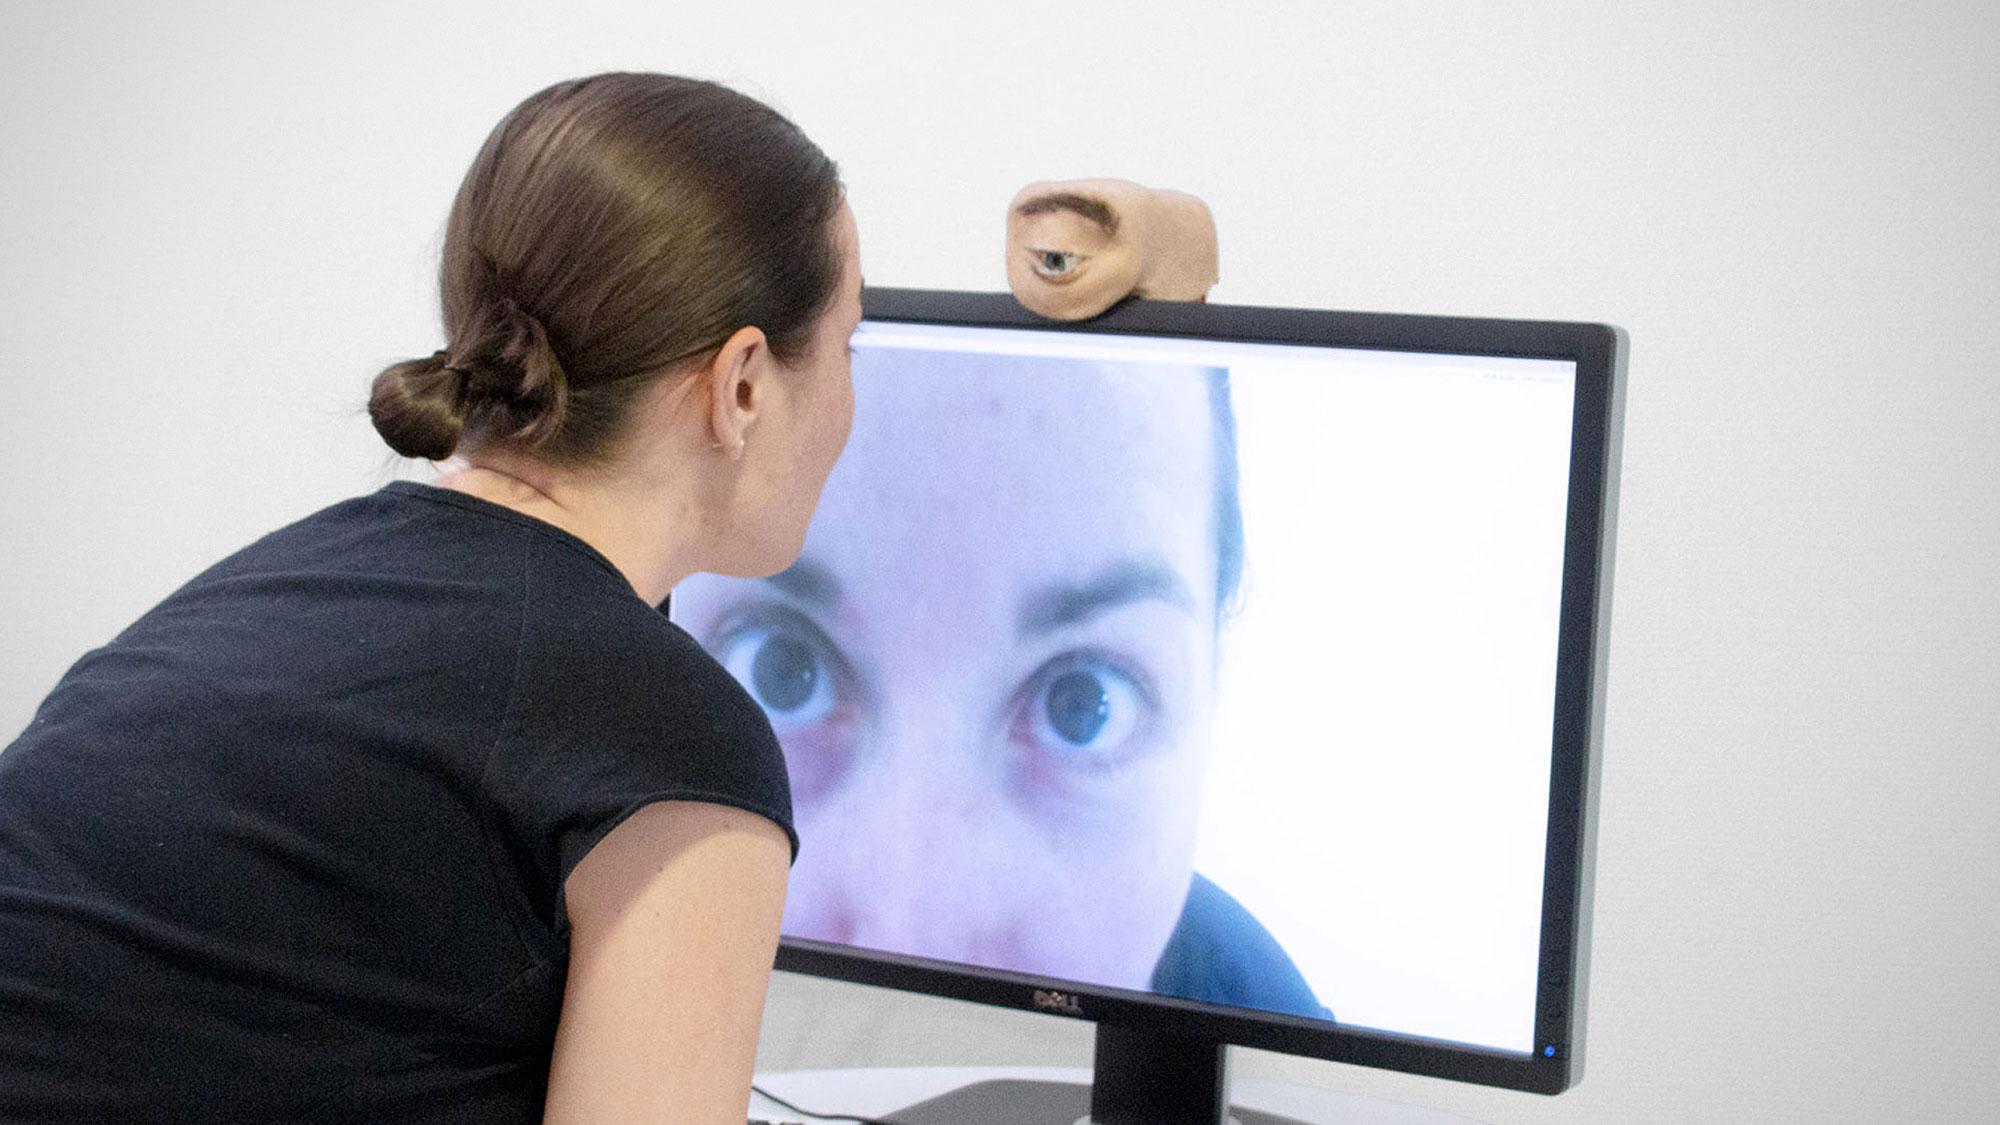 Anthropomorphic Webcam Saarland University